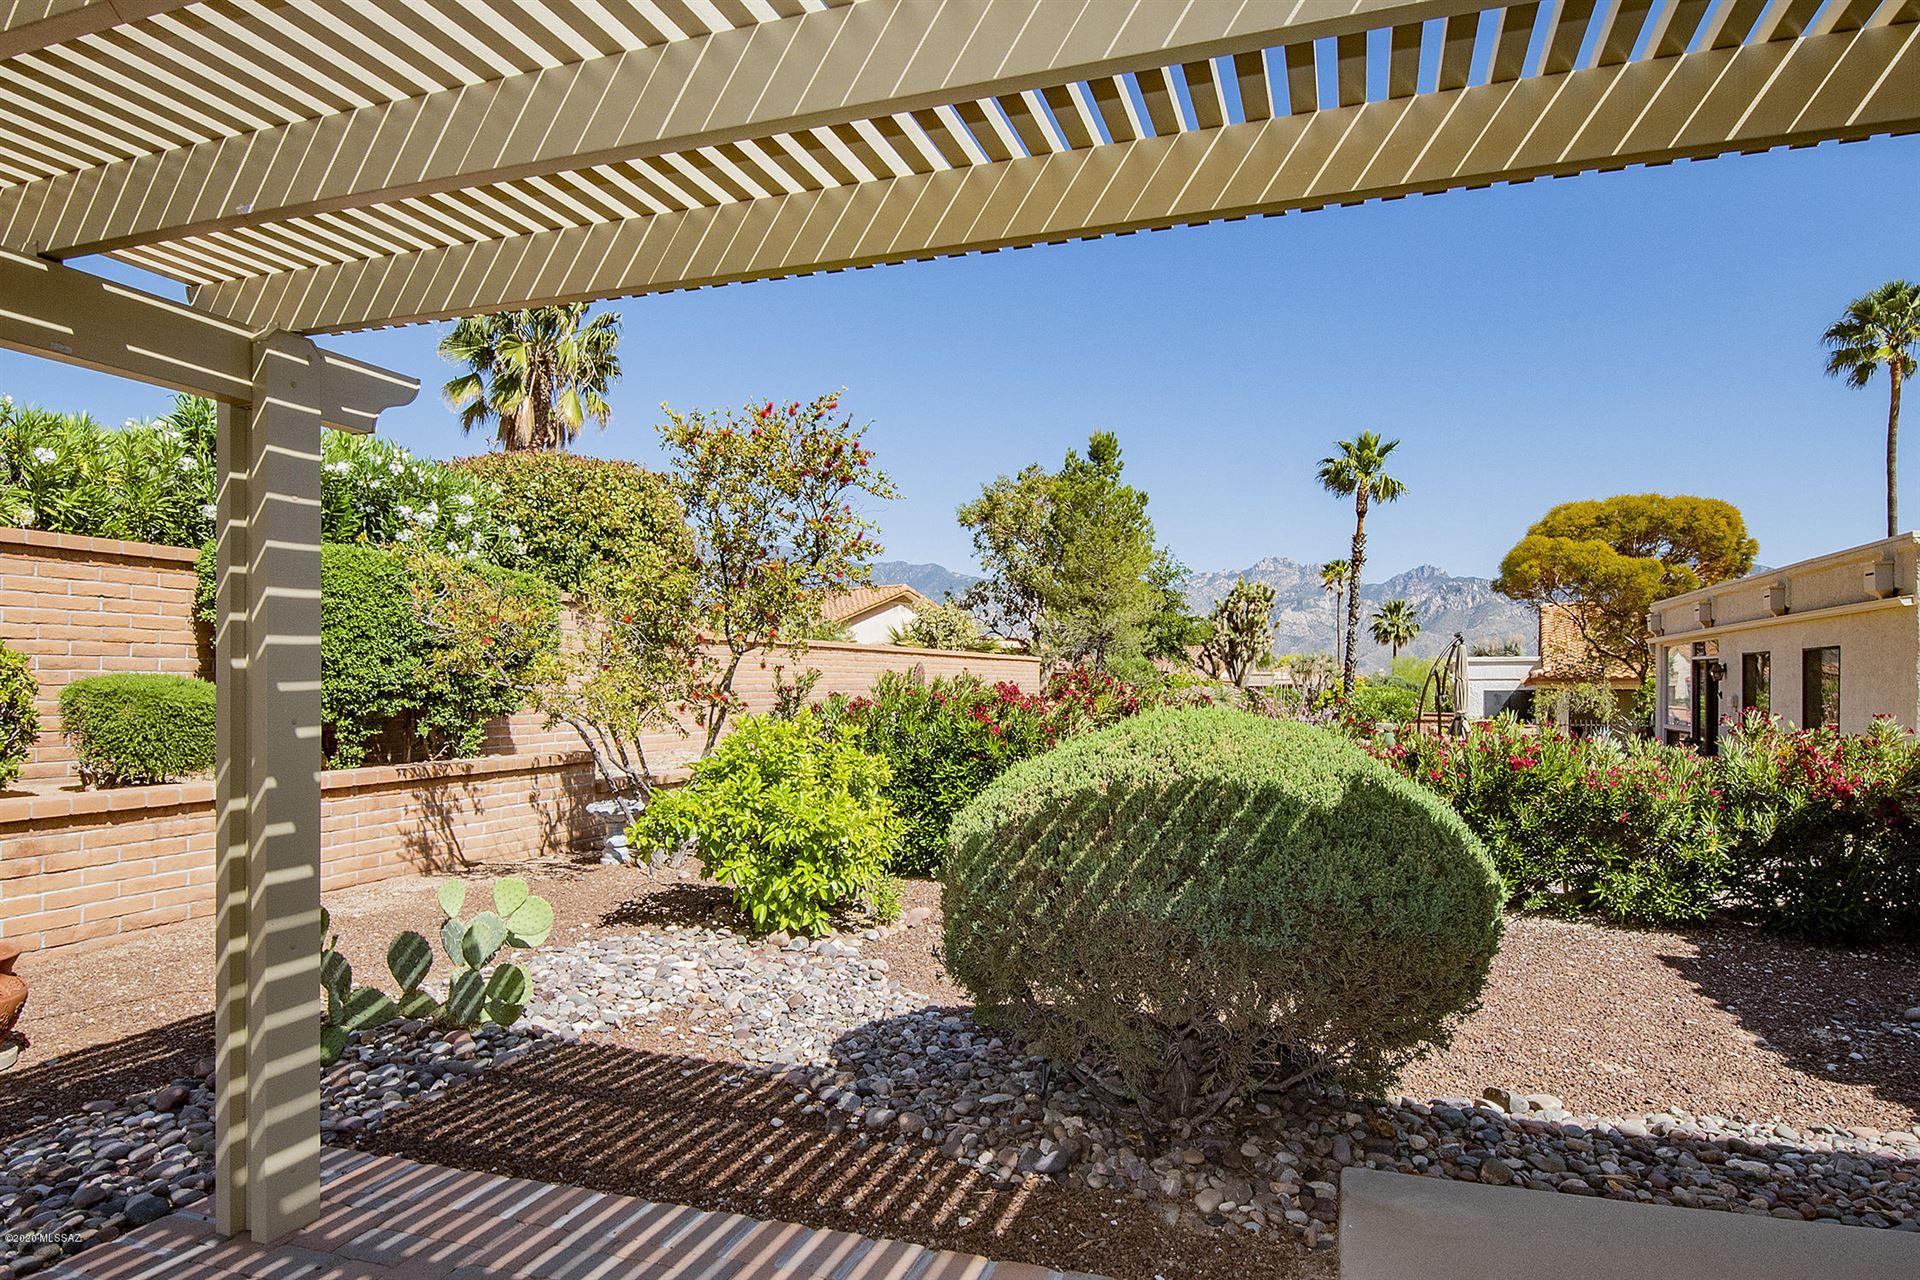 14540 N Line Post Lane, Oro Valley, AZ 85755 - MLS#: 22012112